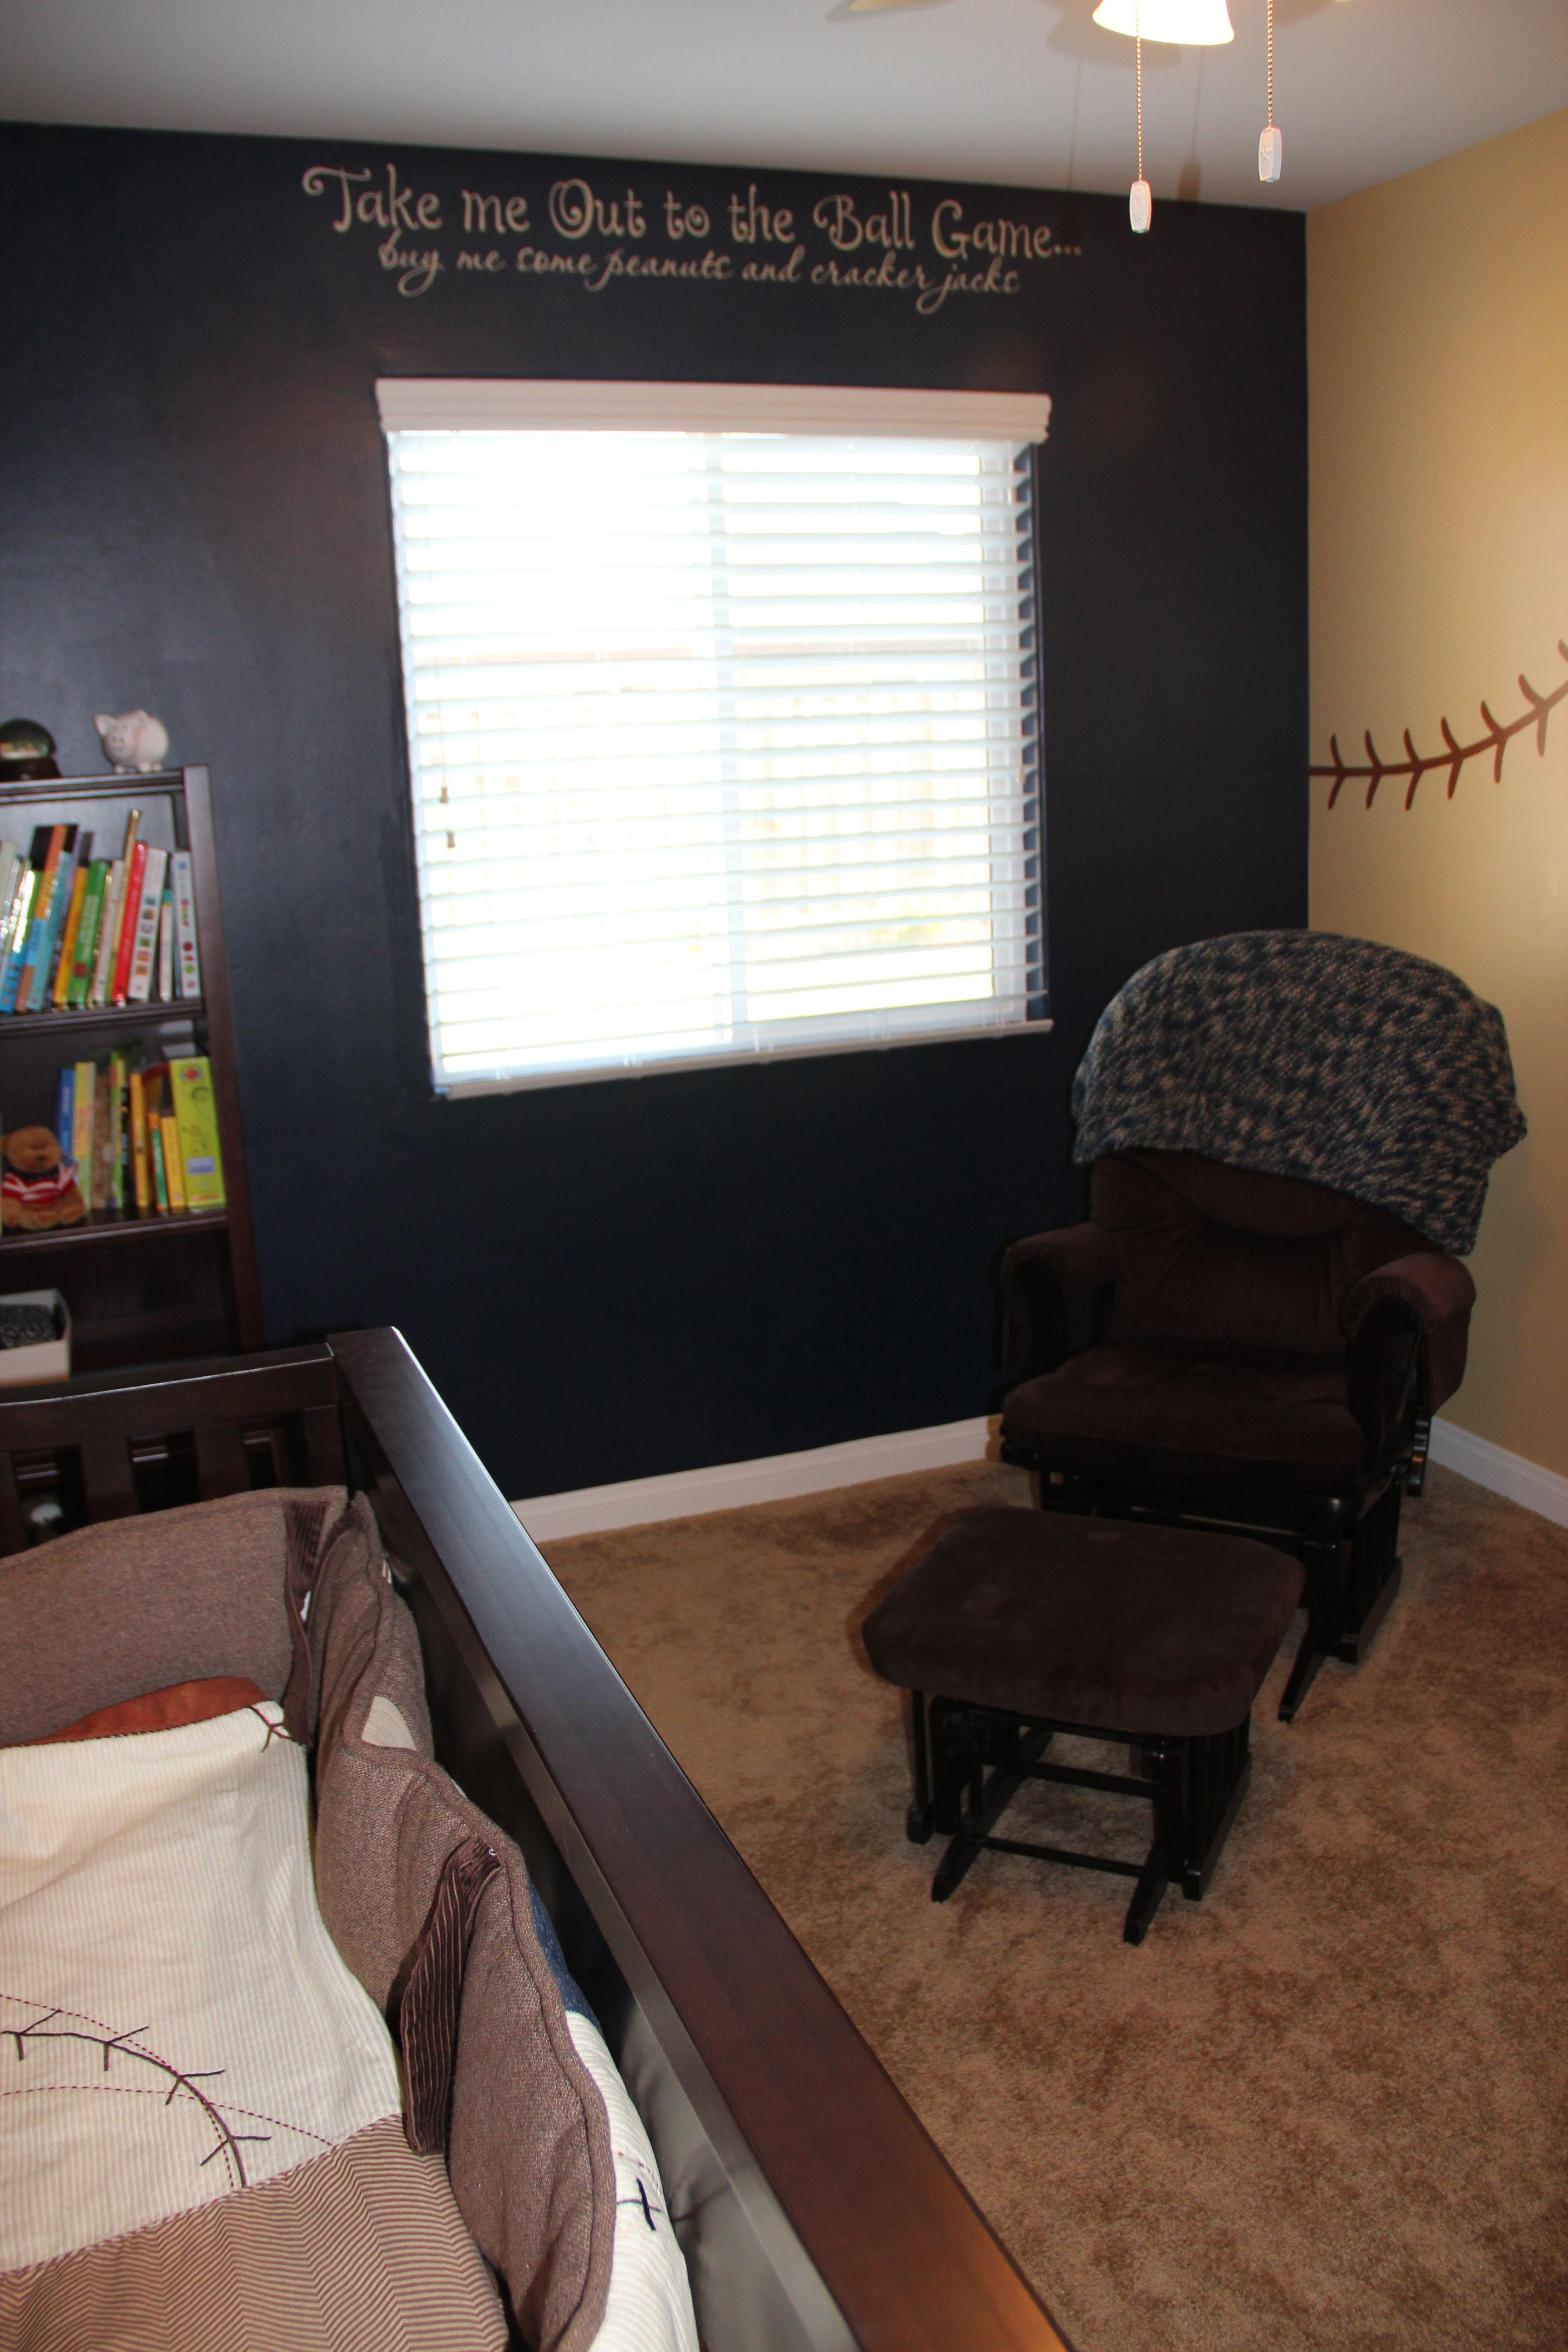 Baseball Bedroom Decal In Memory Of Dad Kids Bedroom